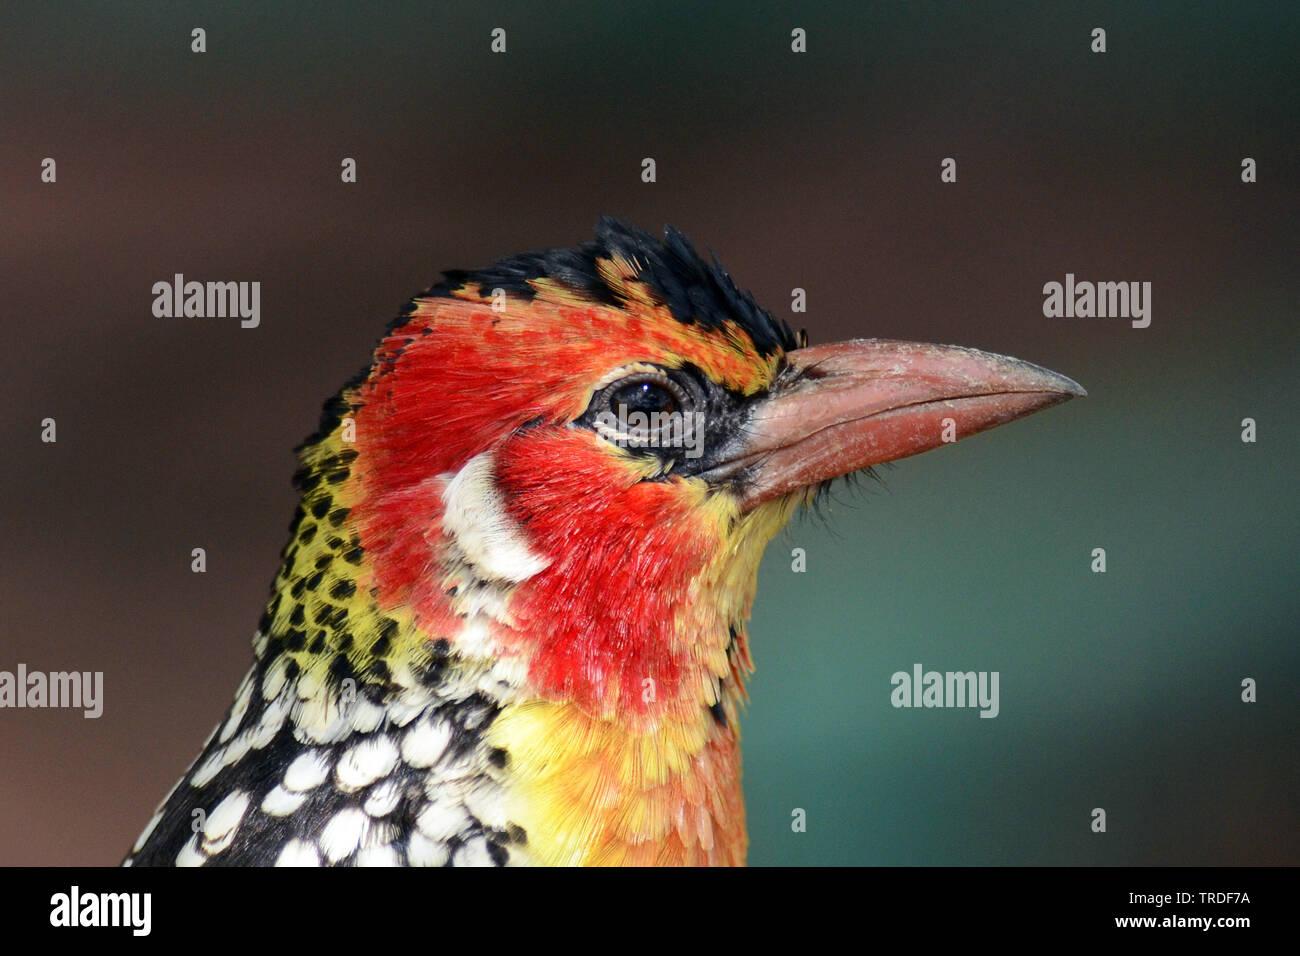 Flammenkopf-Bartvogel, Flammenkopfbartvogel (Trachyphonus erythrocephalus), Portraet, Tansania, Lake Manyara Nationalpark | Red-and-yellow barbet (Tra - Stock Image